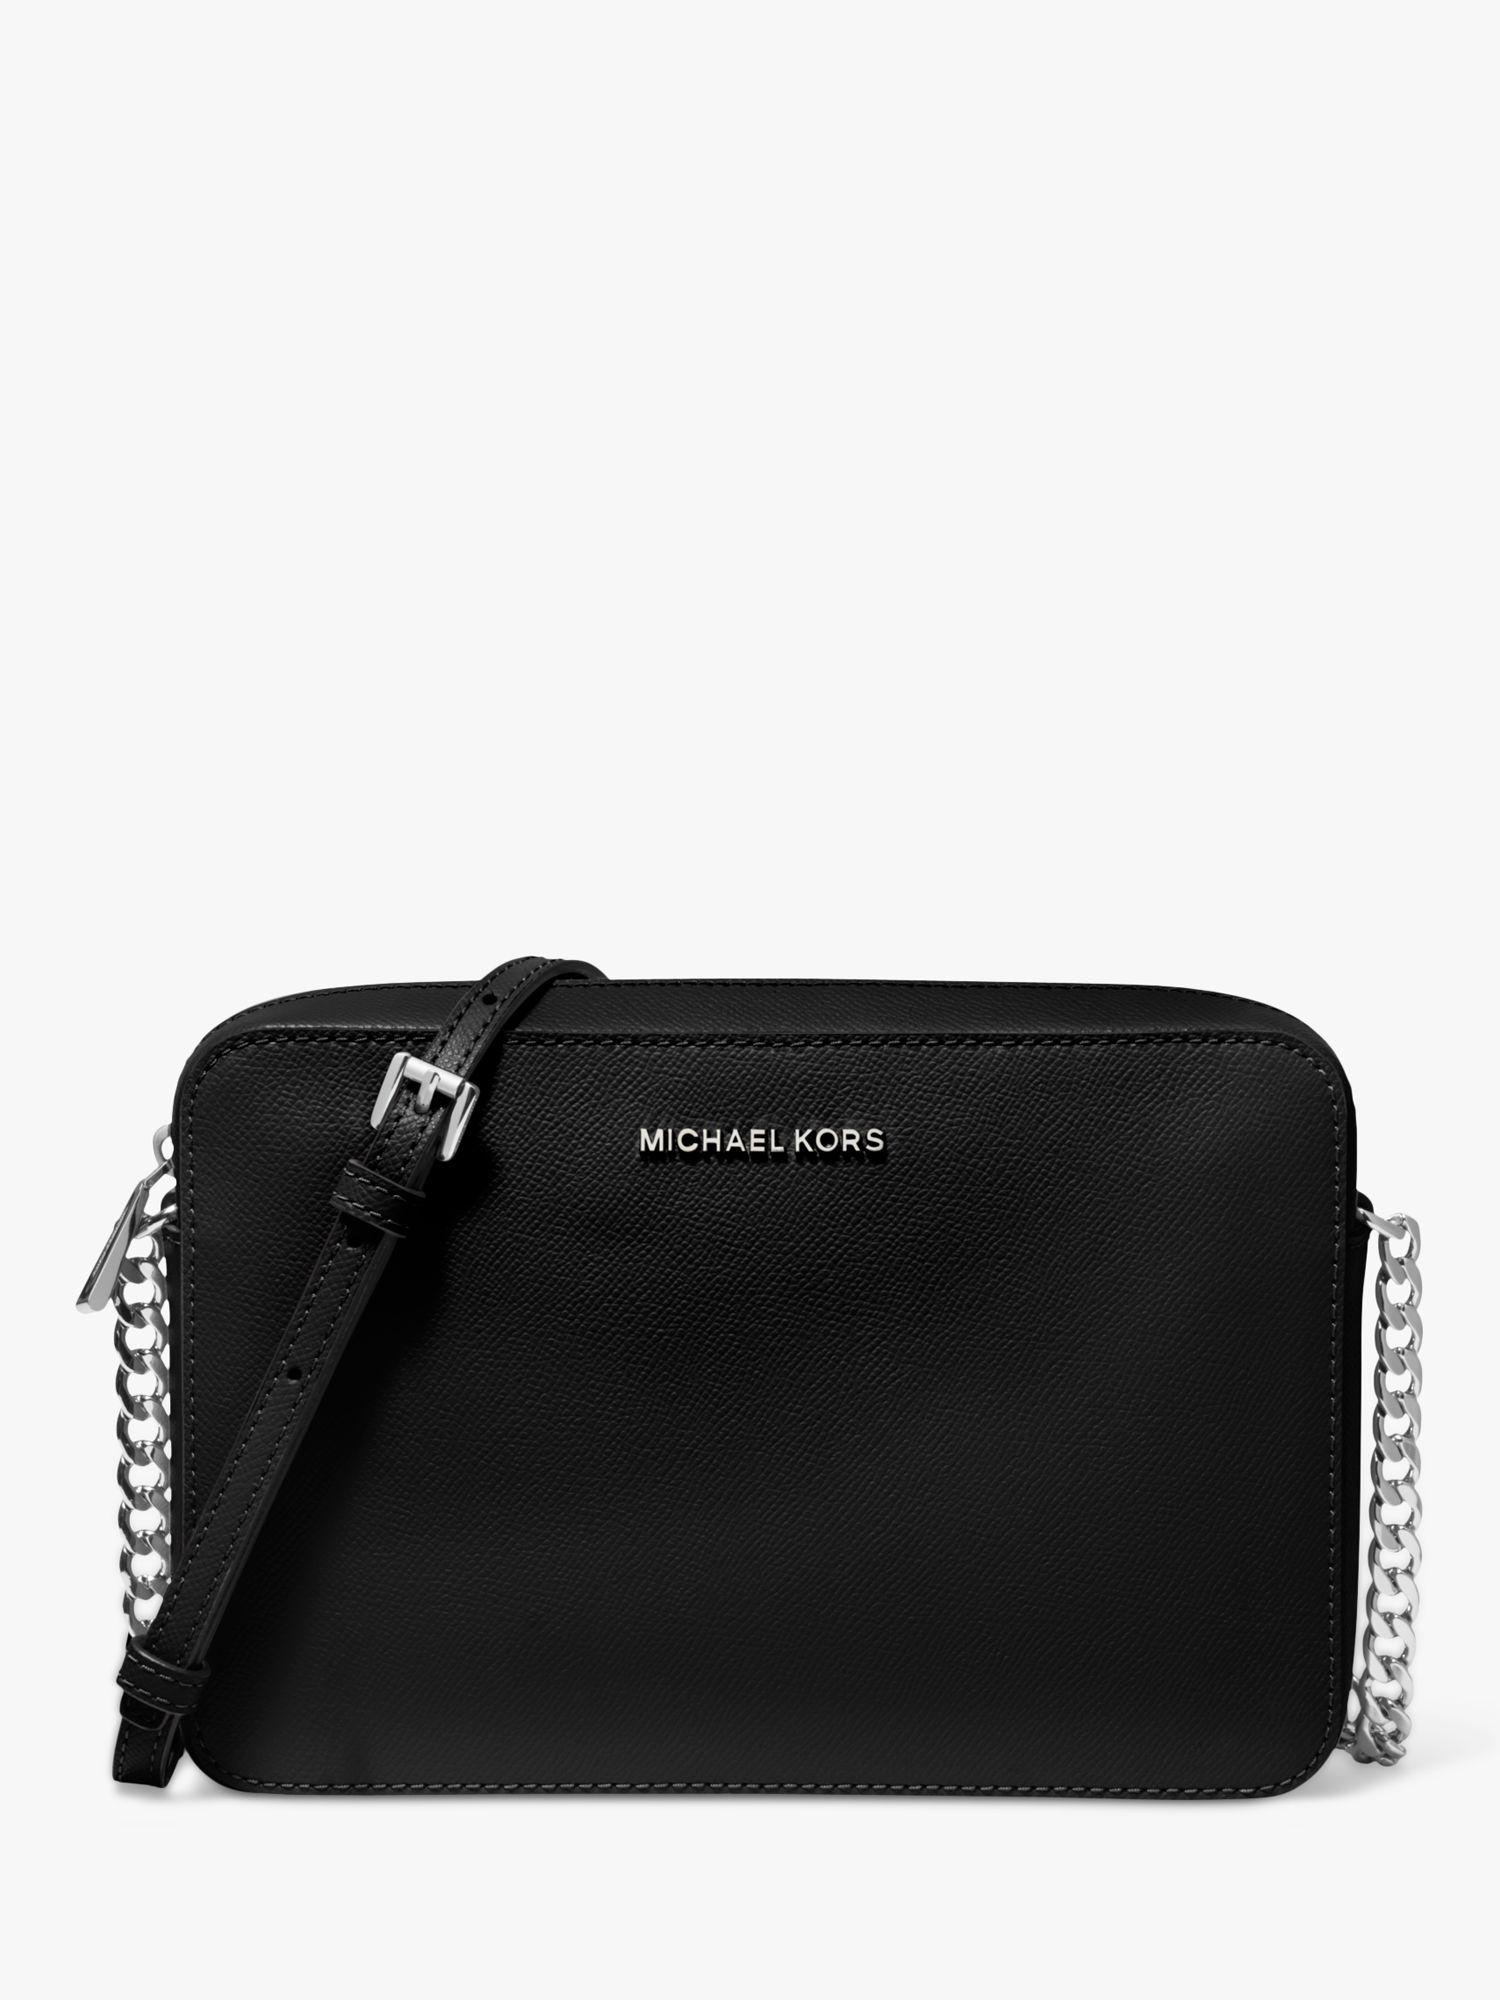 MICHAEL Michael Kors Jet Set Travel Leather East West Cross Body Bag, BlackSilver